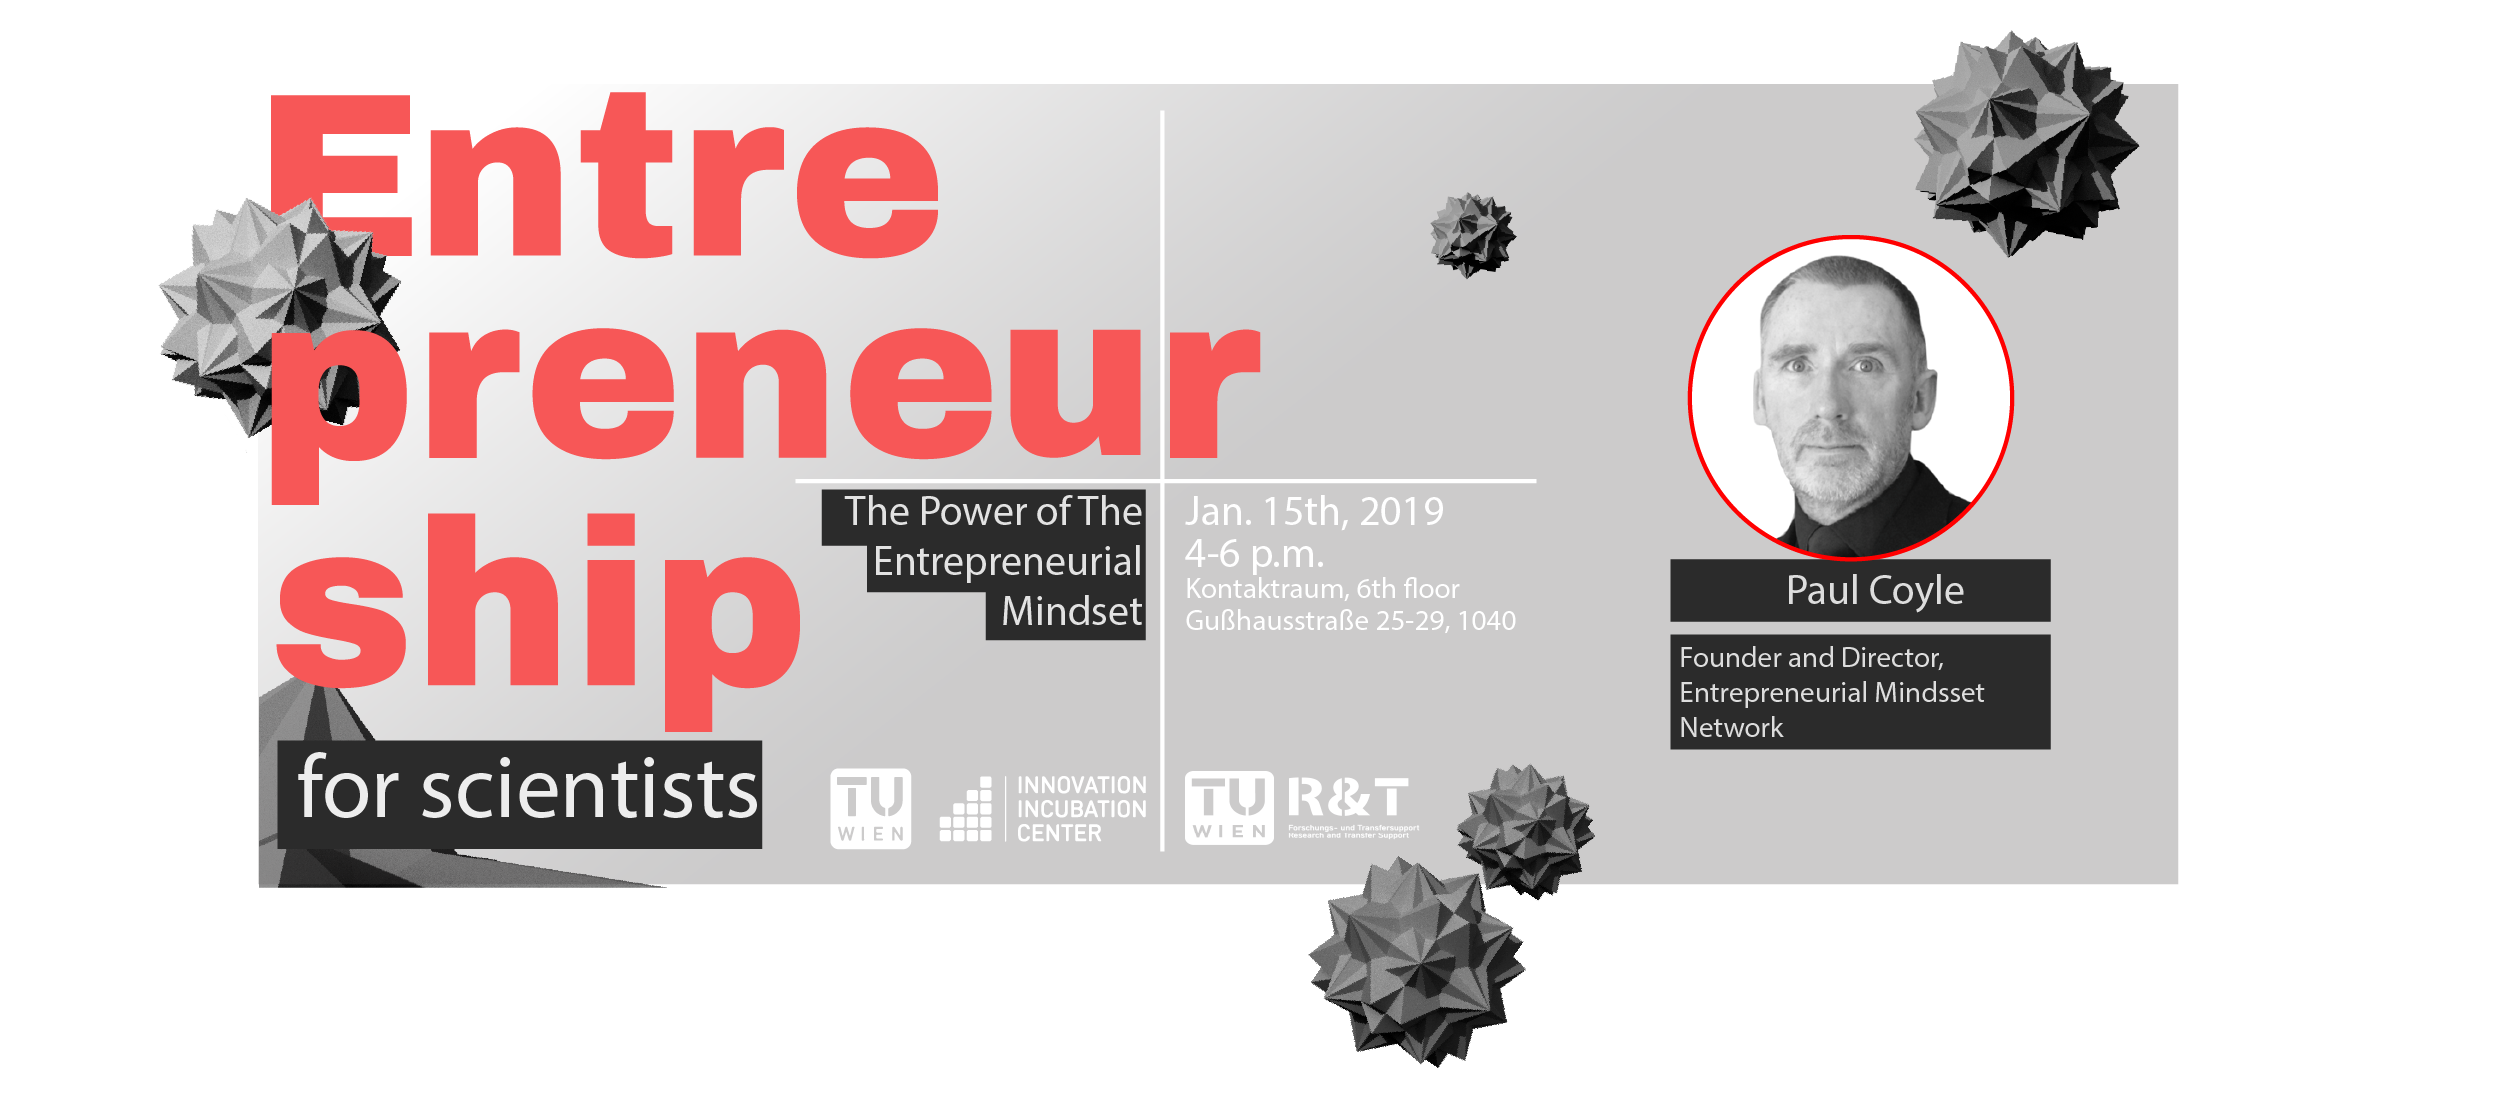 Entrepreneurship for Scientists: The Power of The Entrepreneurial Mindset